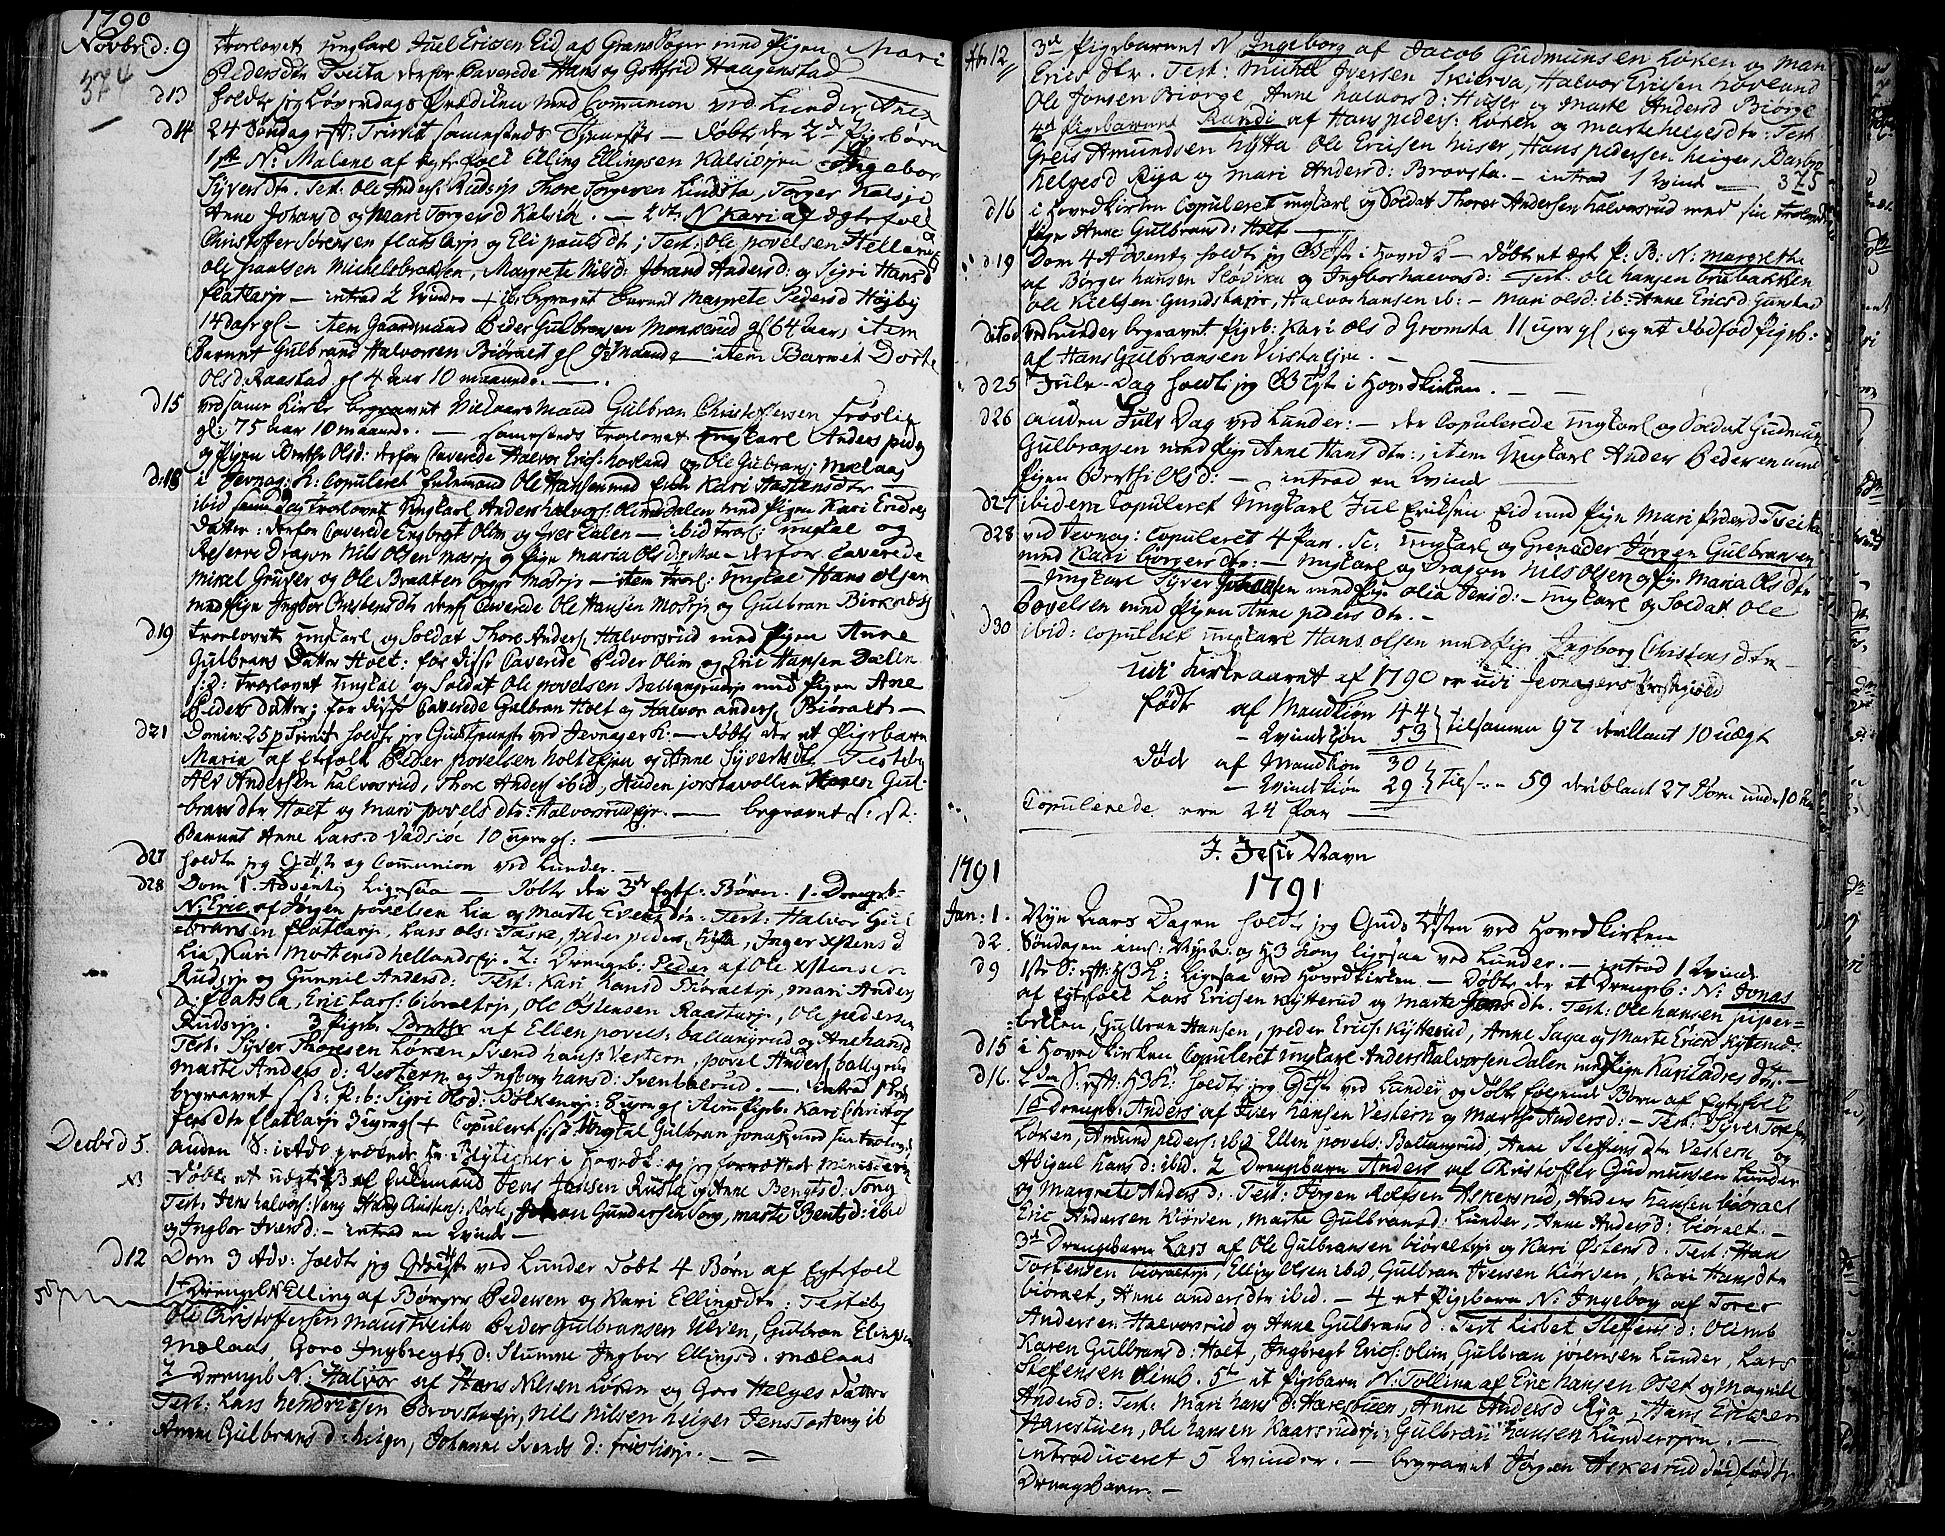 SAH, Jevnaker prestekontor, Ministerialbok nr. 3, 1752-1799, s. 374-375